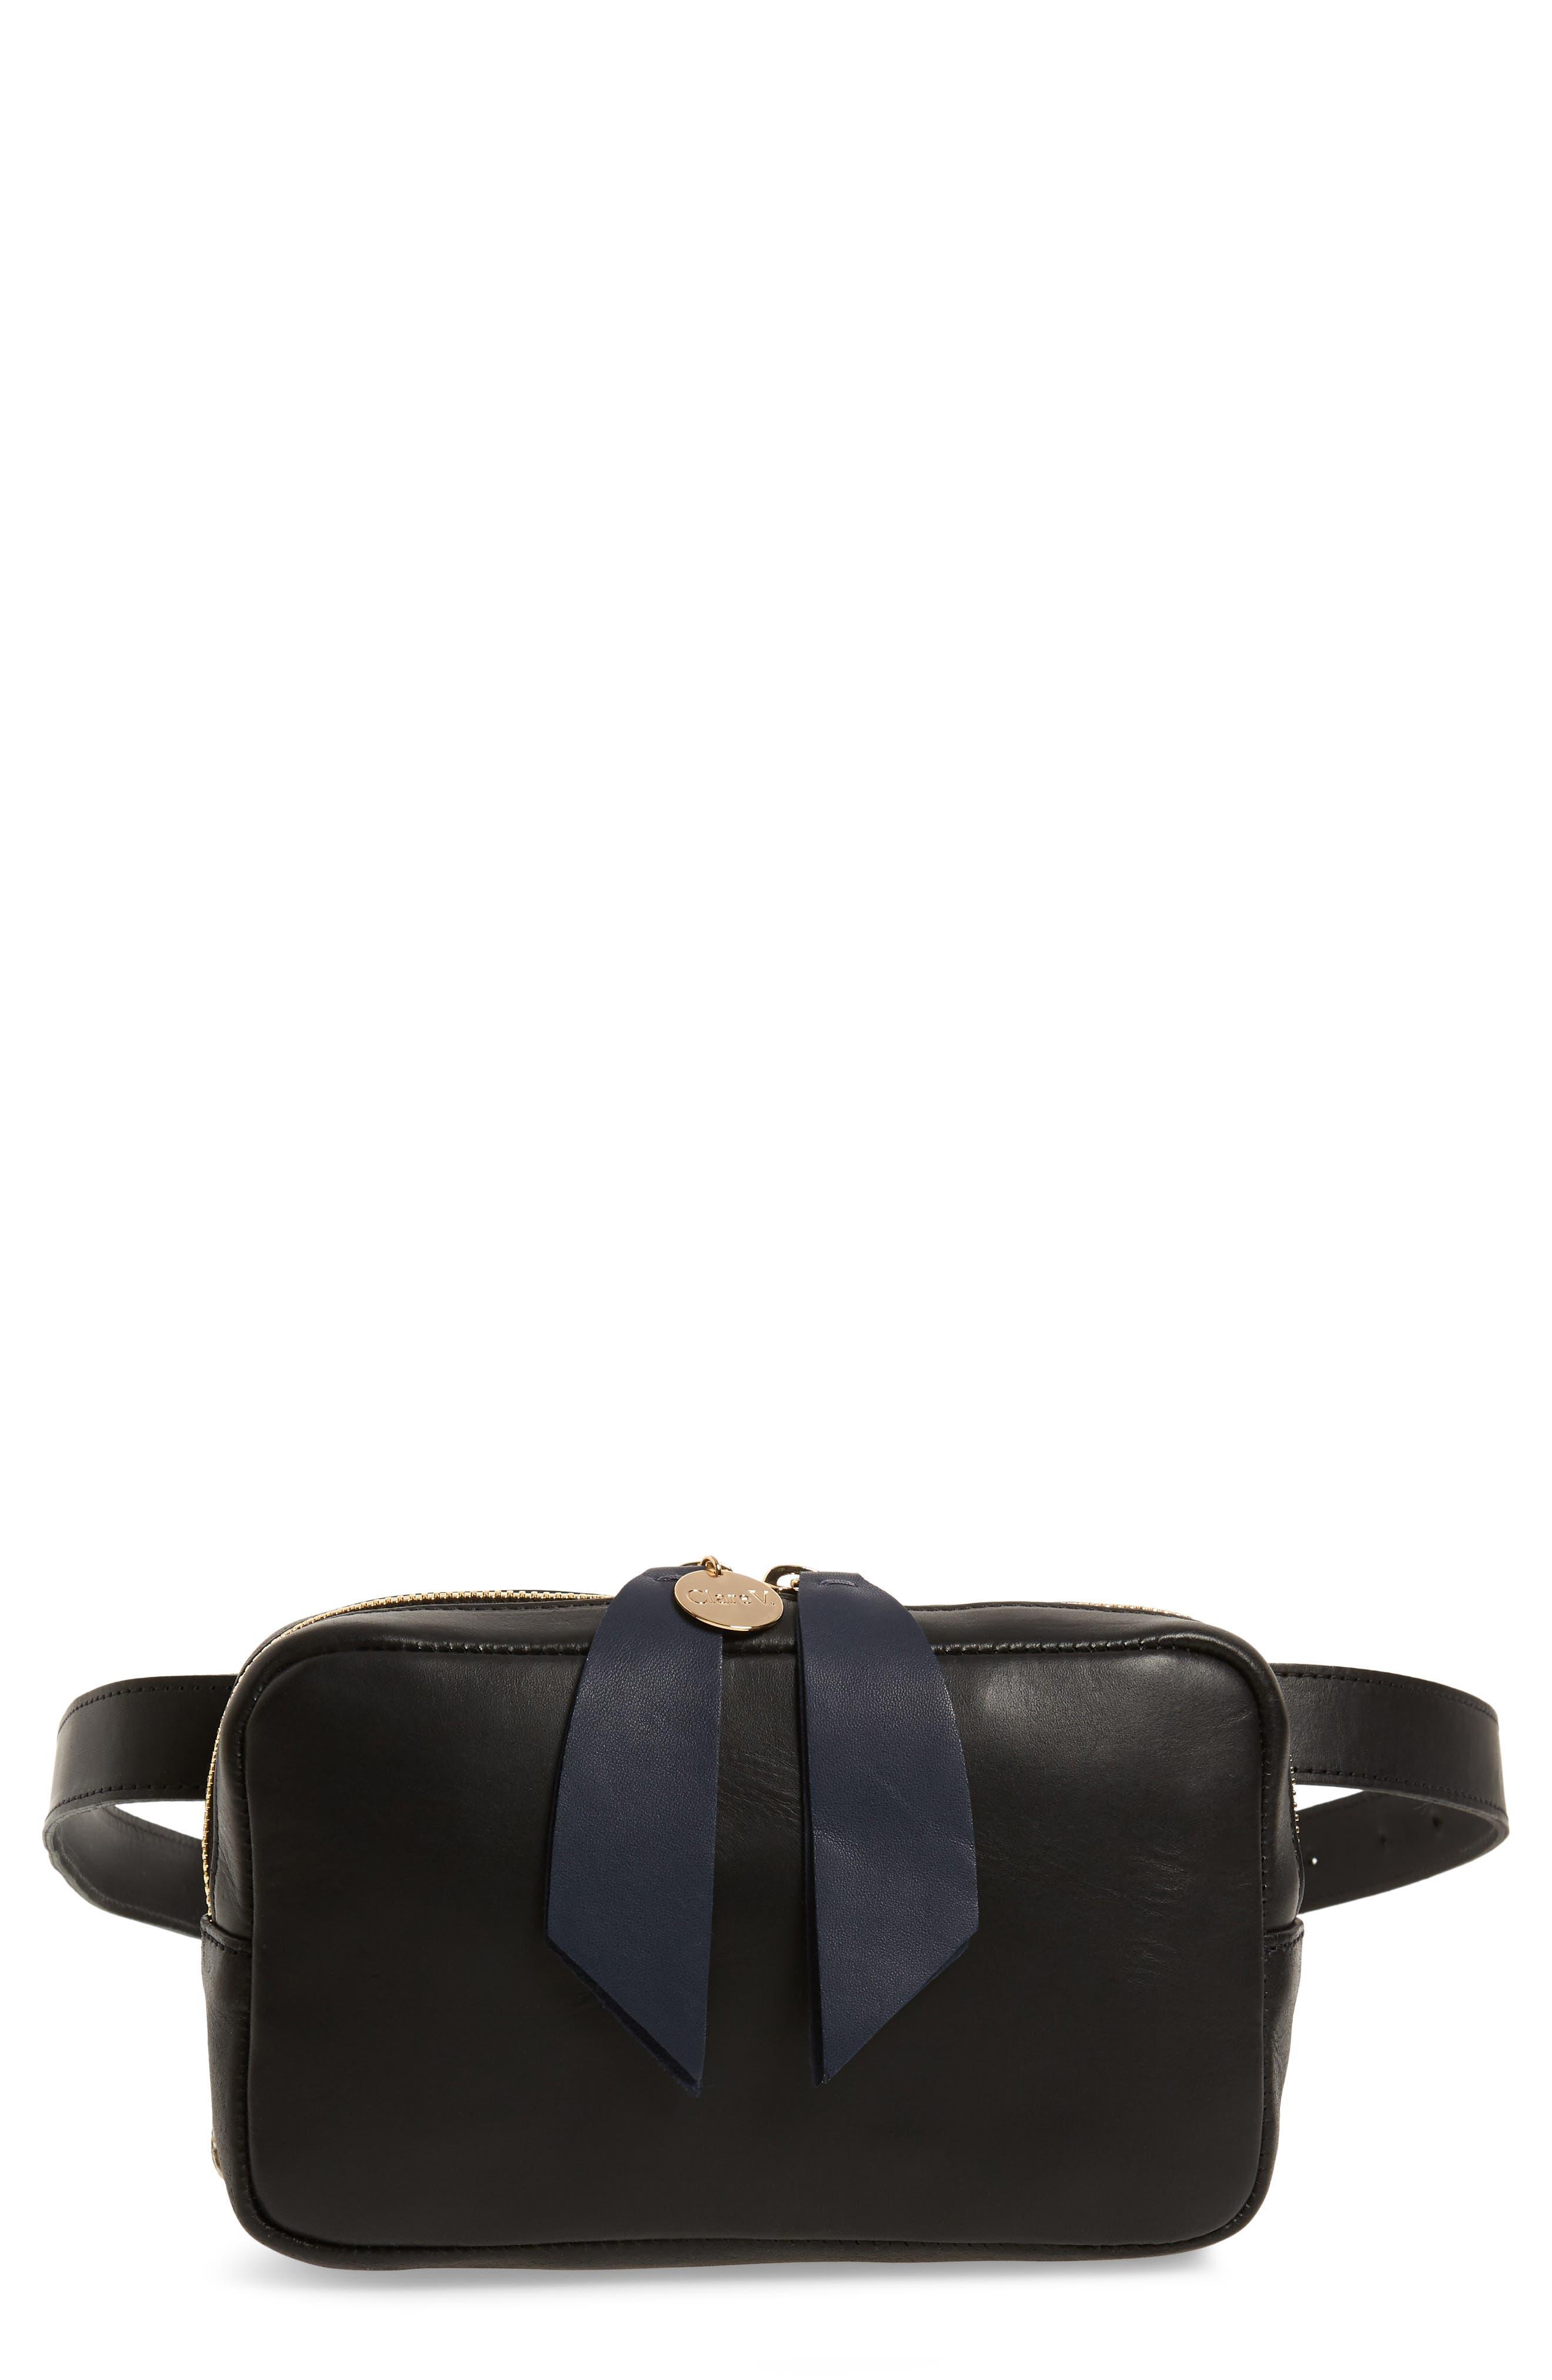 Le Belt Leather Convertible Crossbody Bag, Main, color, BLACK VEGAN